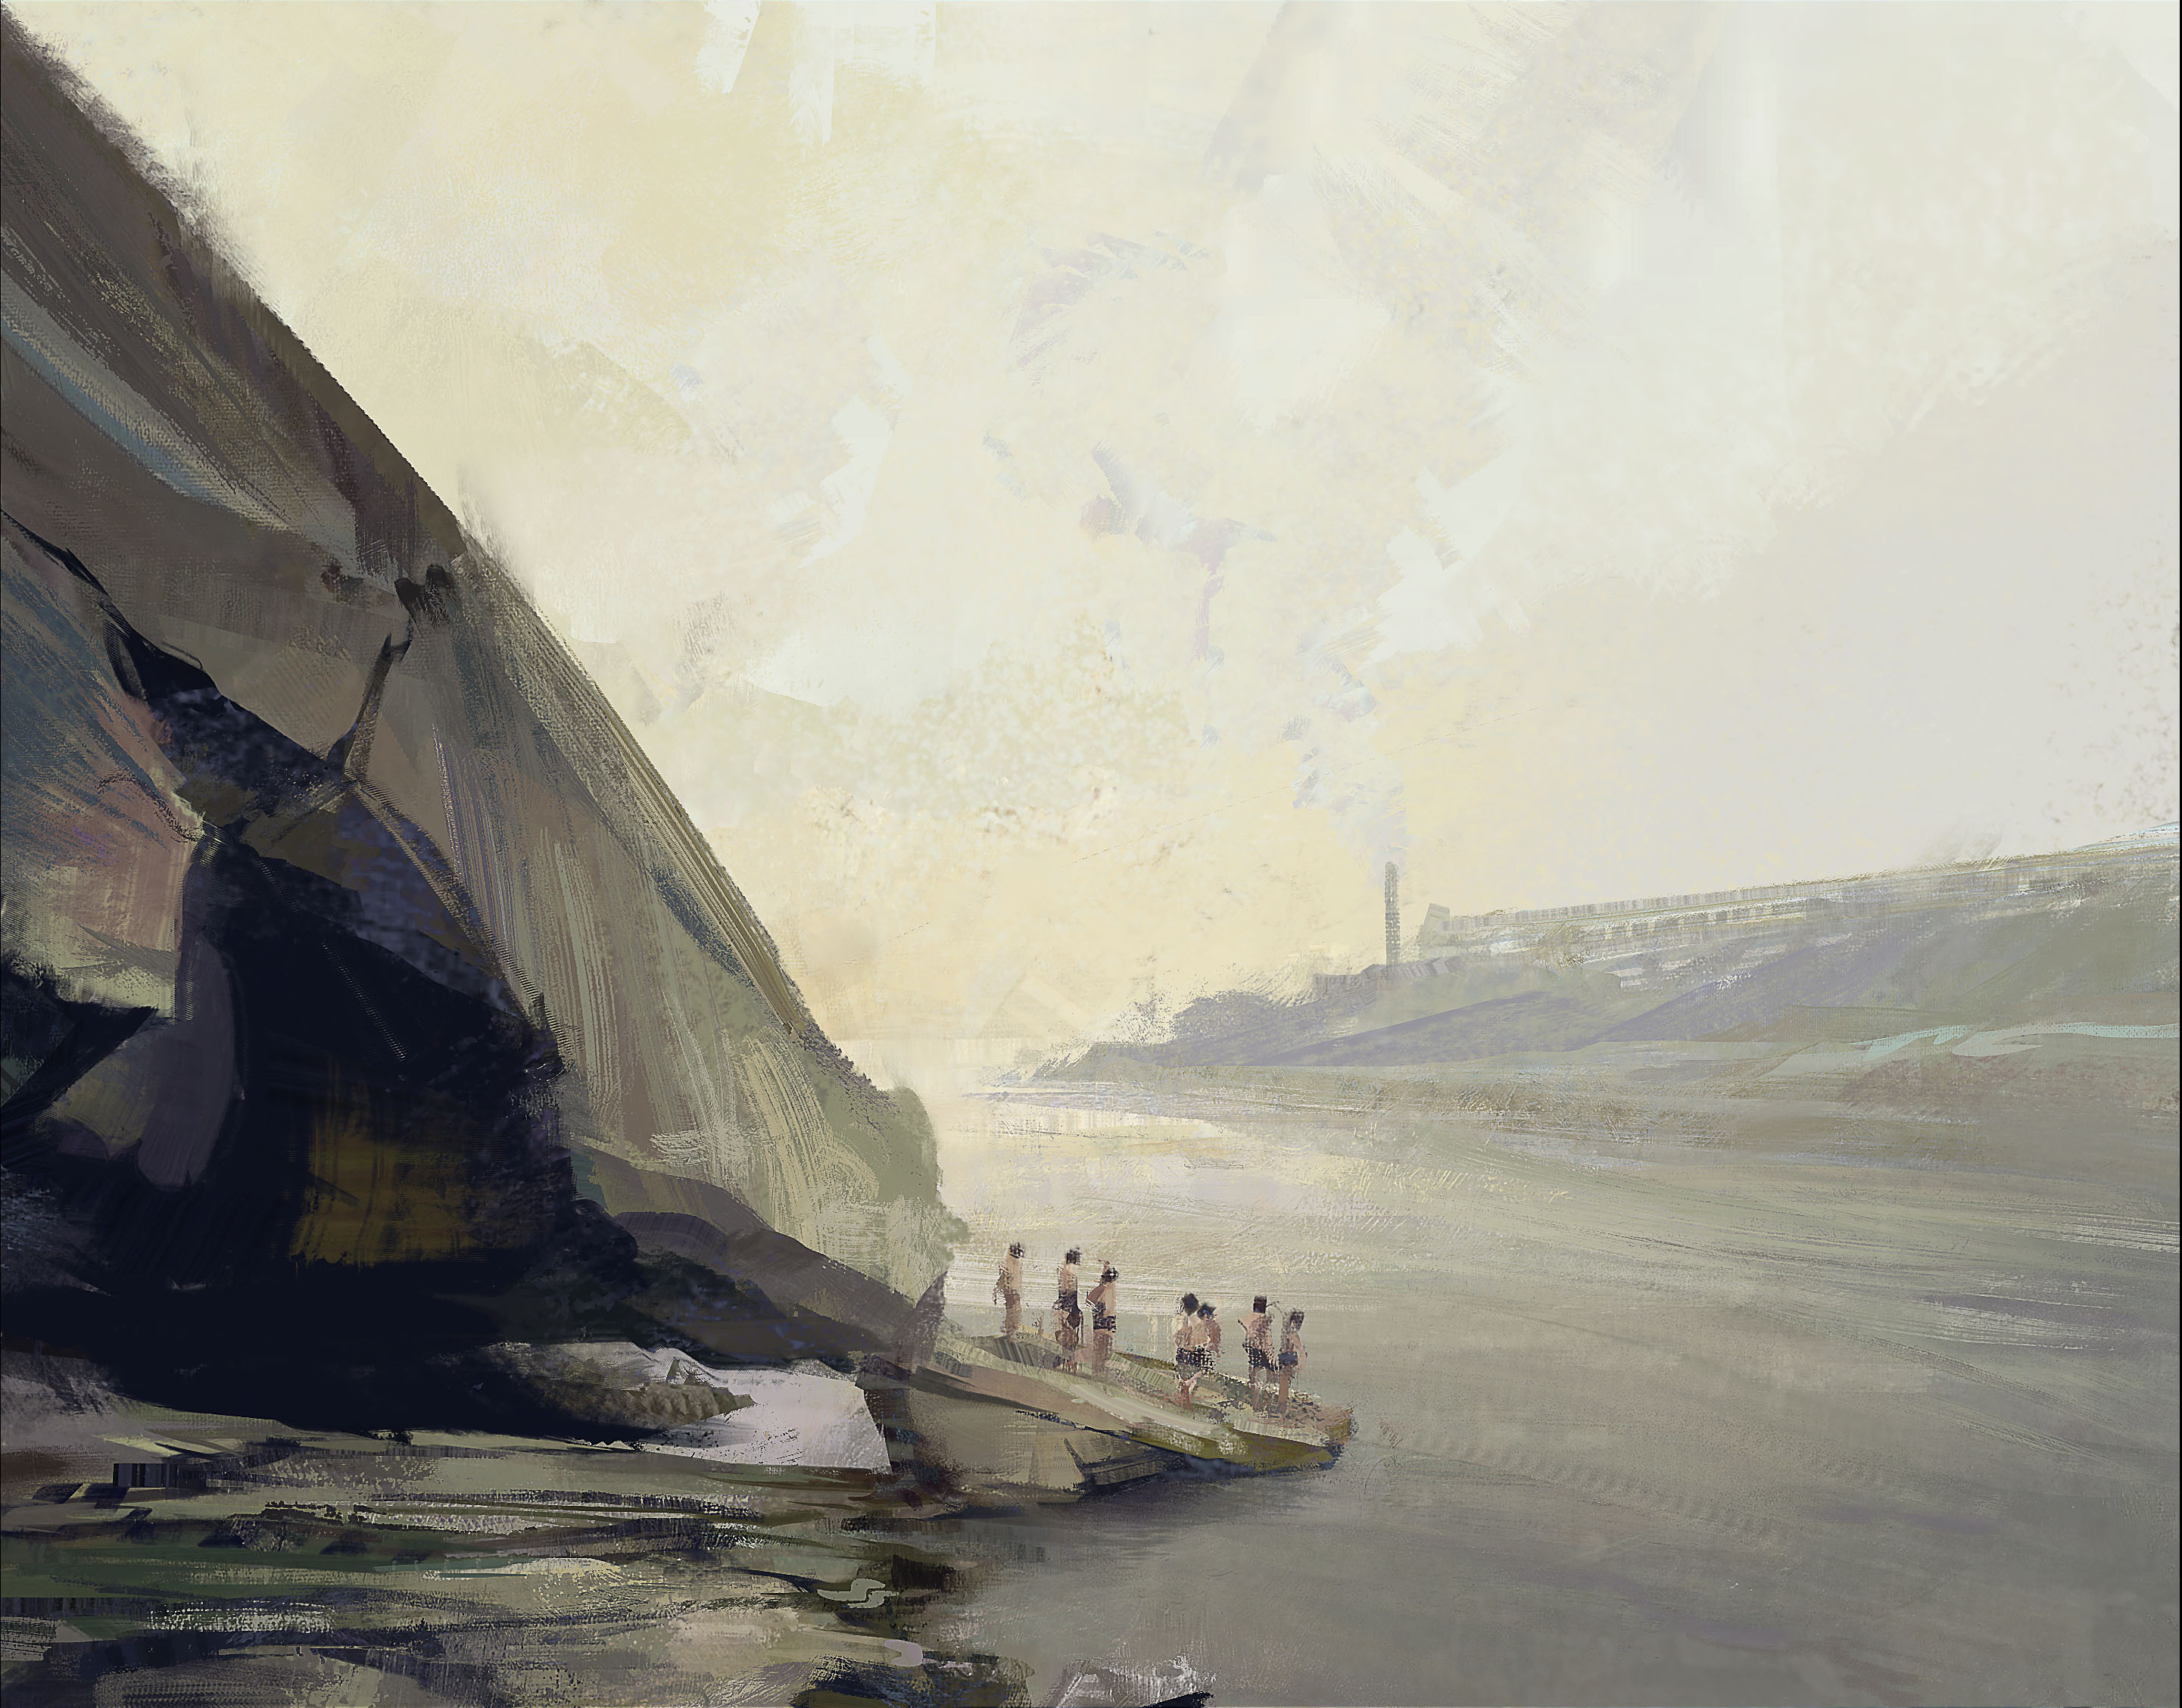 Yangtze swimmers